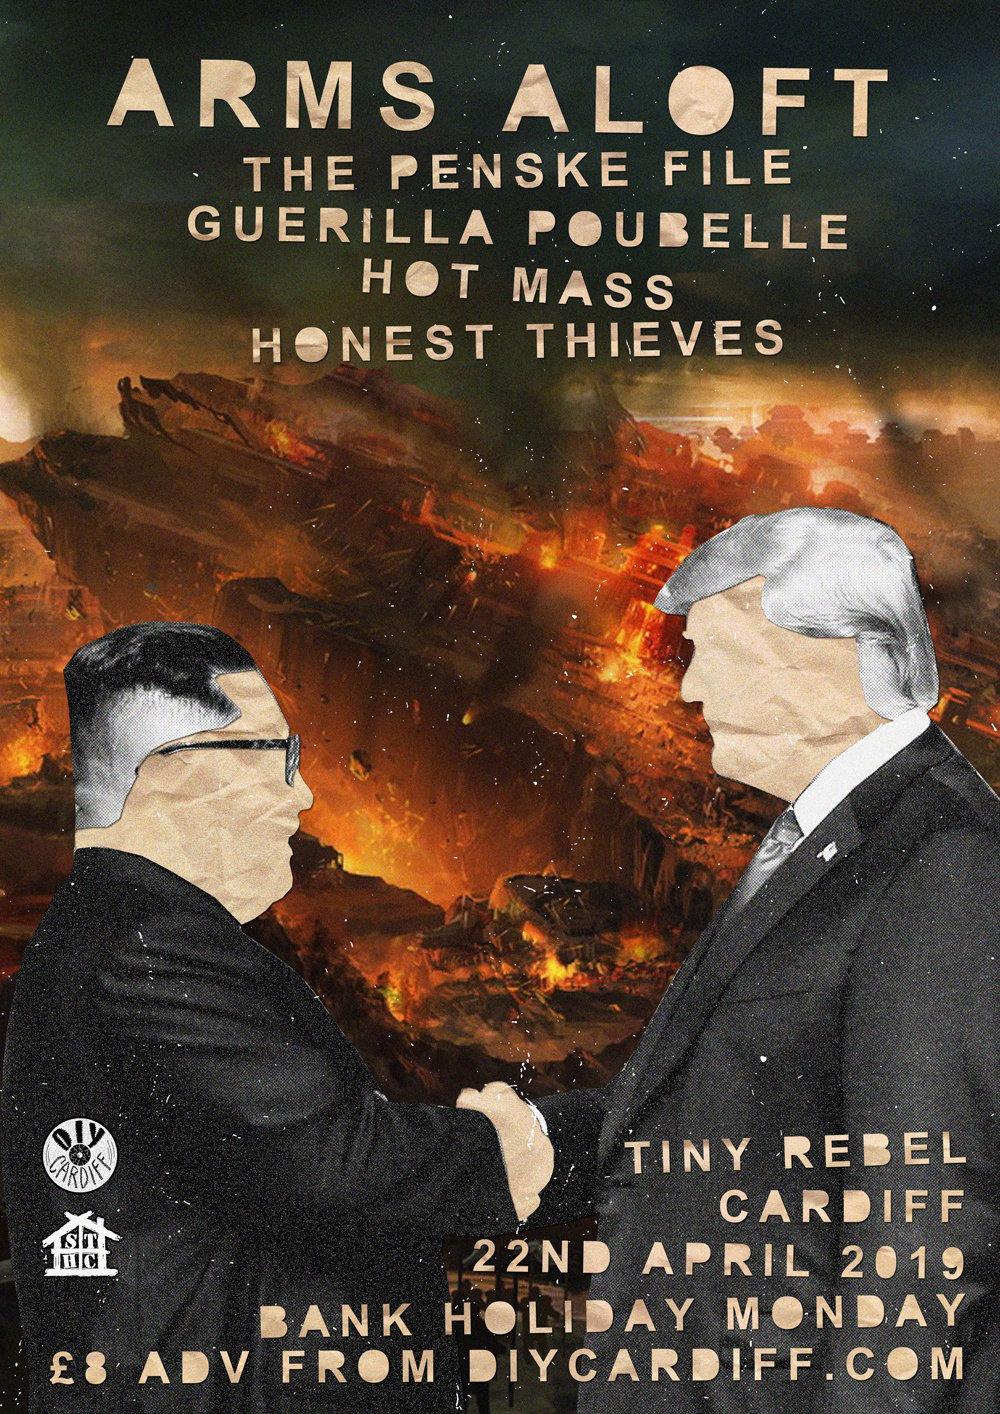 Image of Arms Aloft, The Penske File, Guerilla Poubelle, Hot Mass, Honest Thieves @ Tiny Rebel